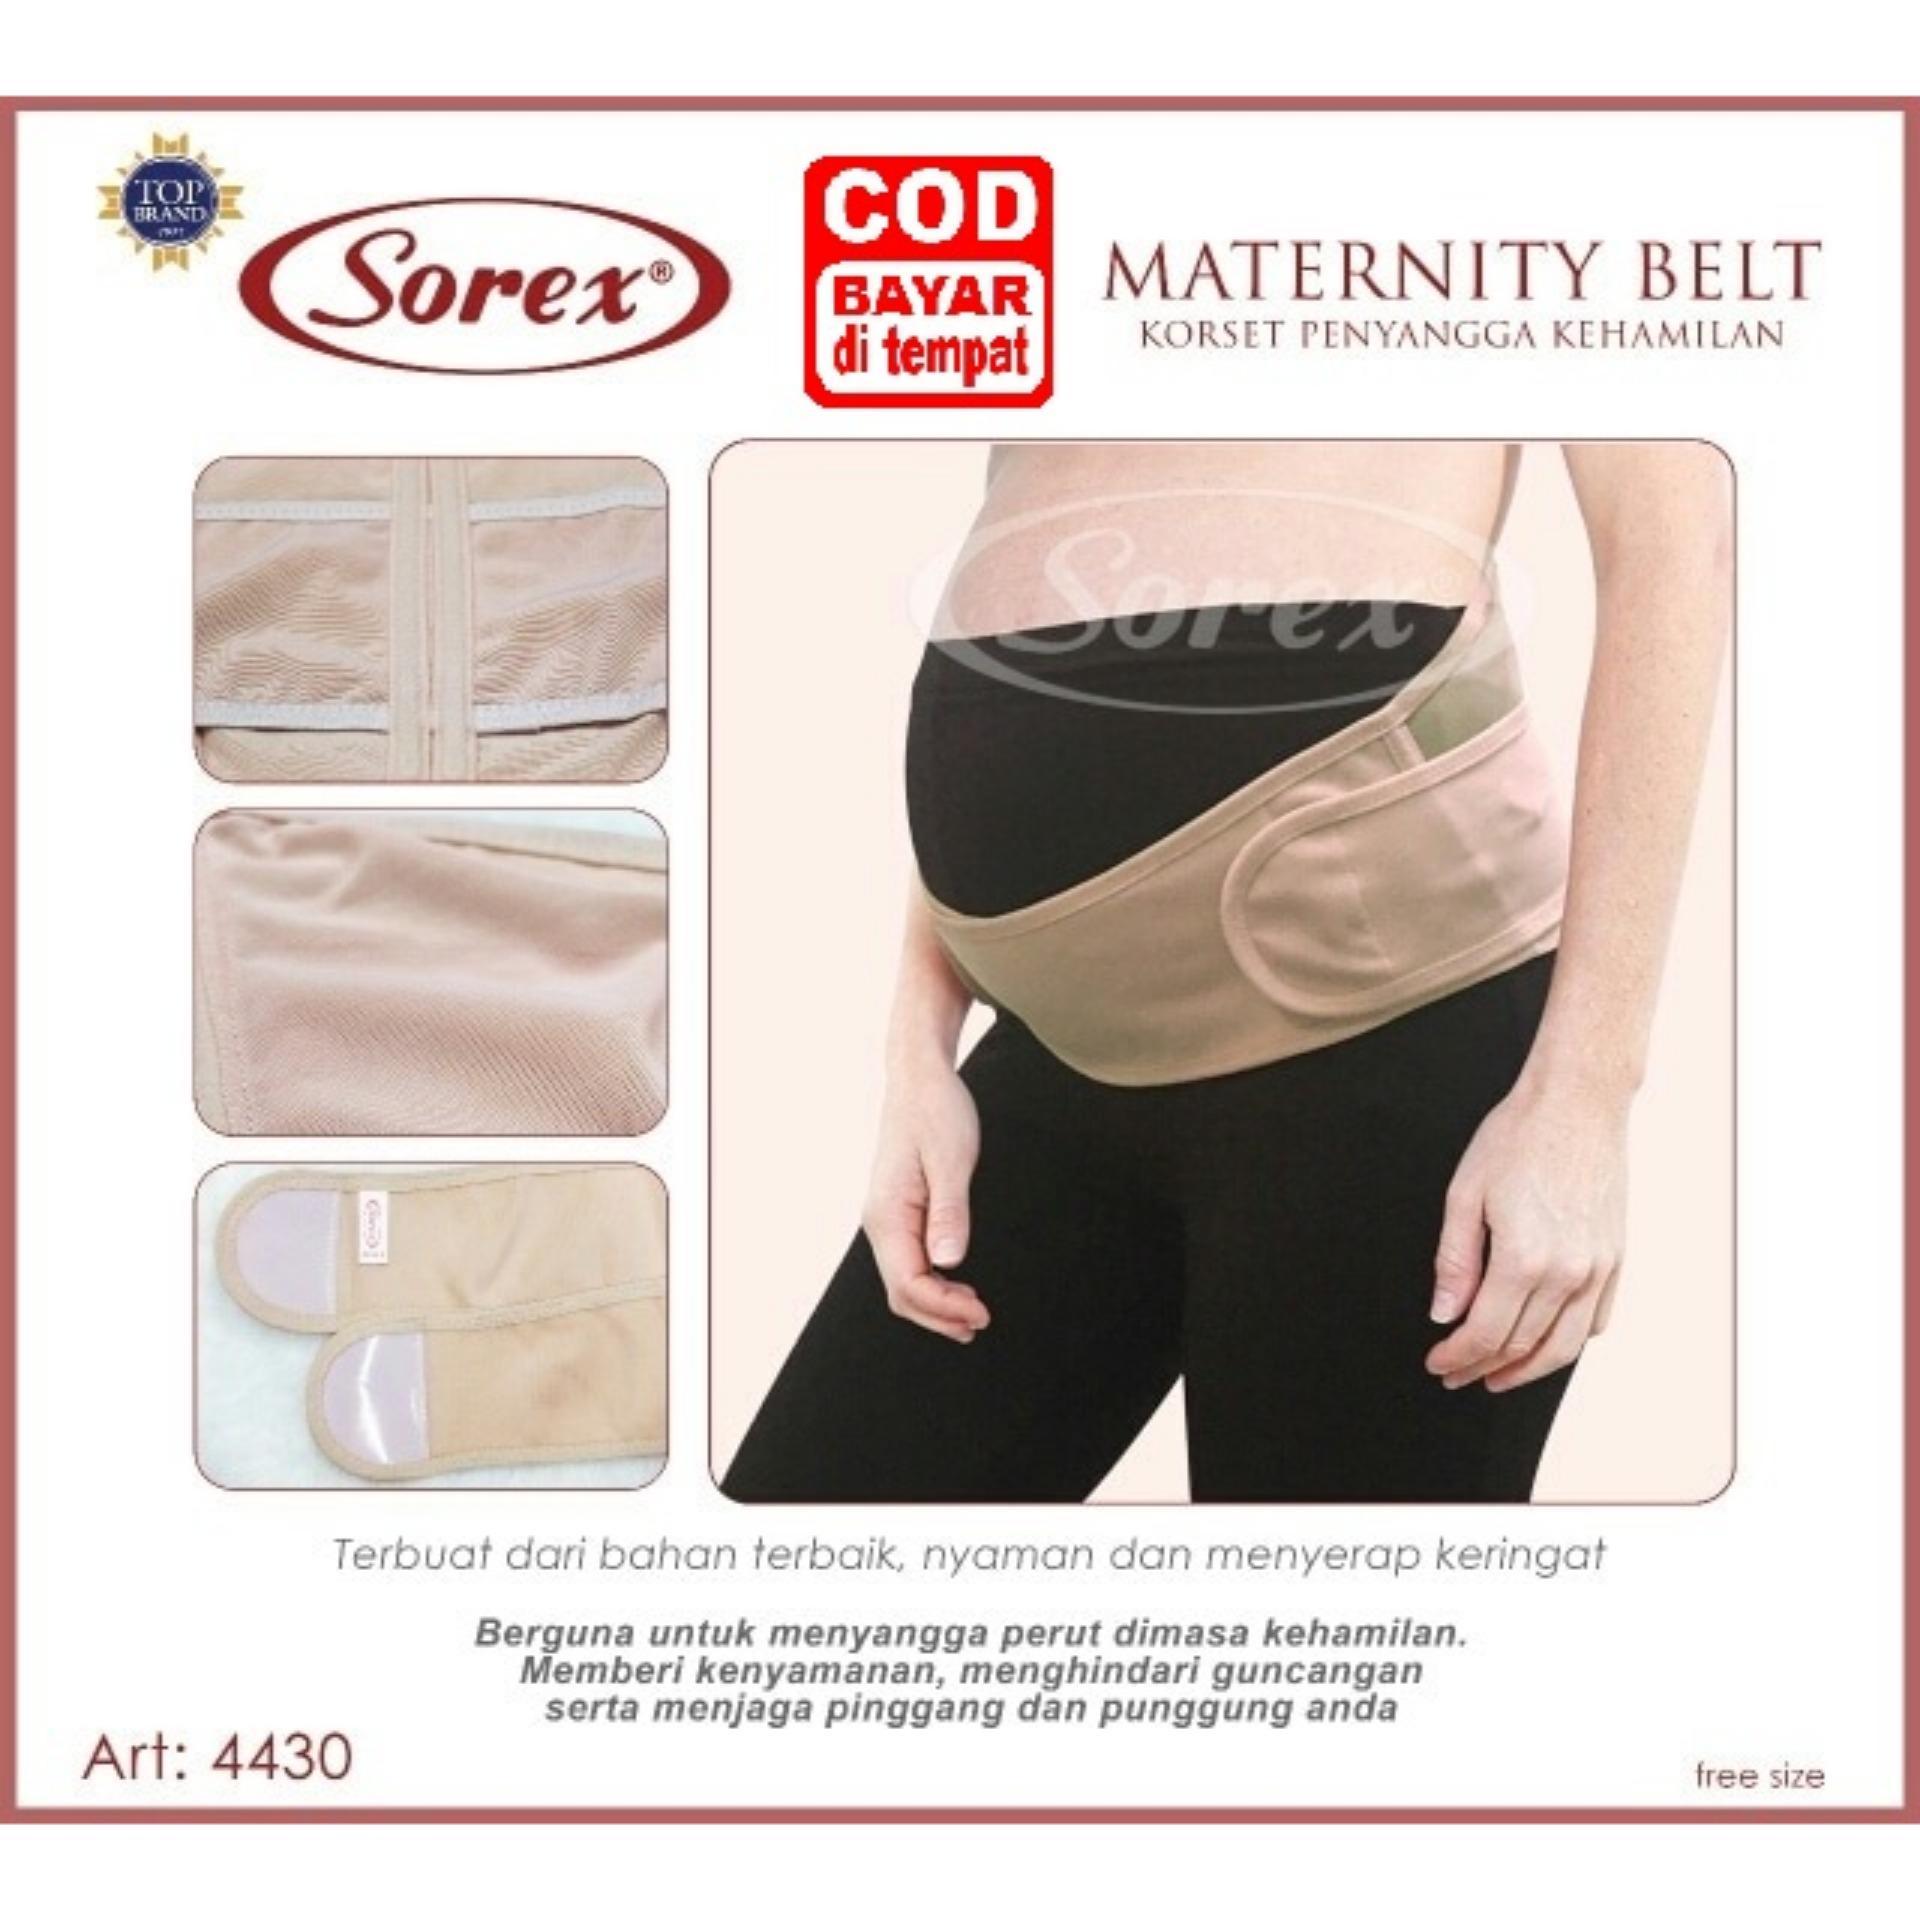 Sorex - Maternity Belt Kecil - Korset Ibu Hamil 4430 merk Sorex